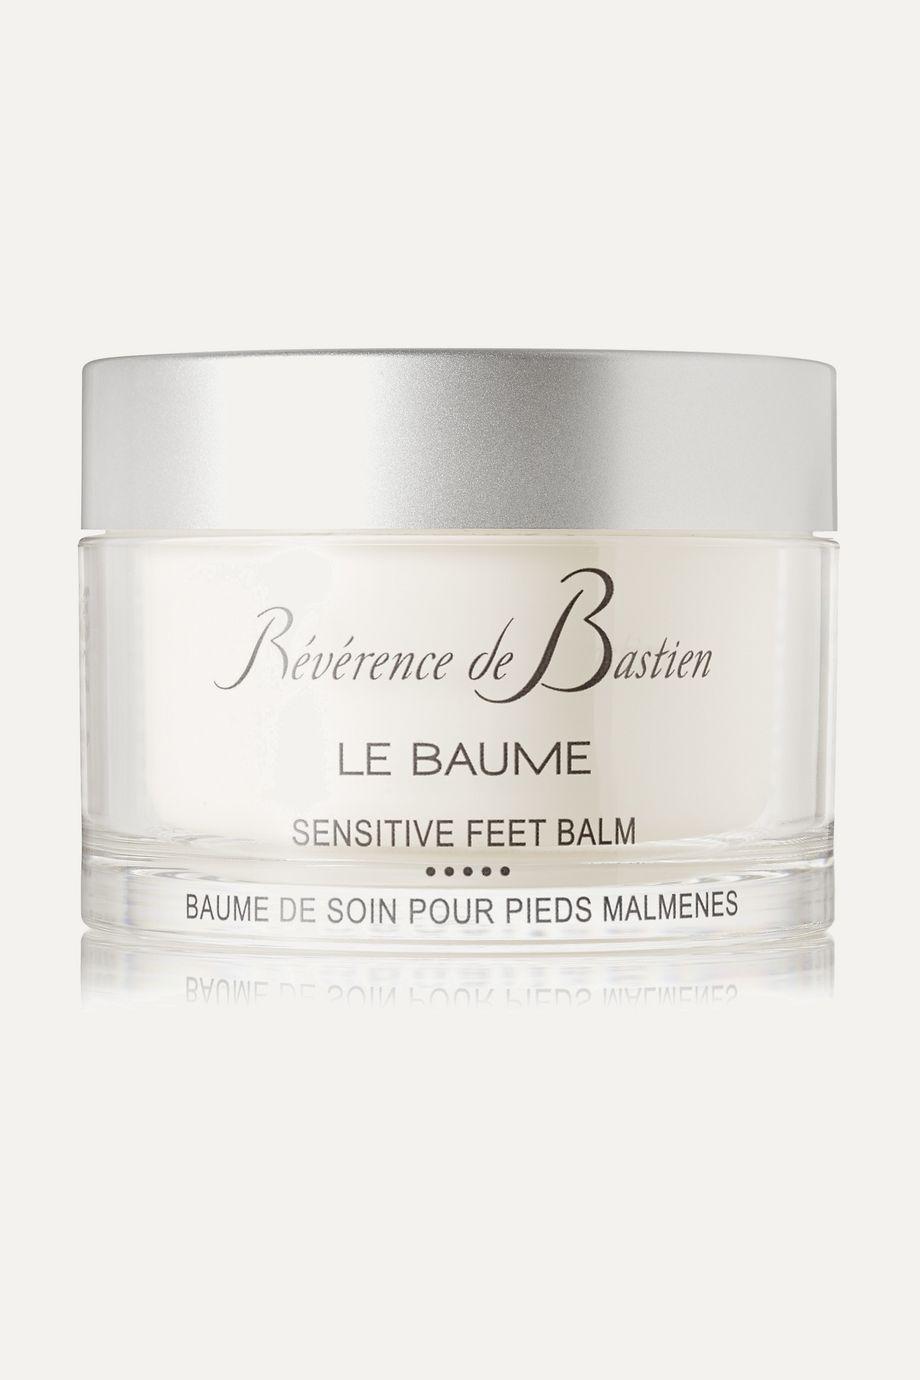 REVERENCE DE BASTIEN Le Baume Sensitive Feet Balm, 200ml